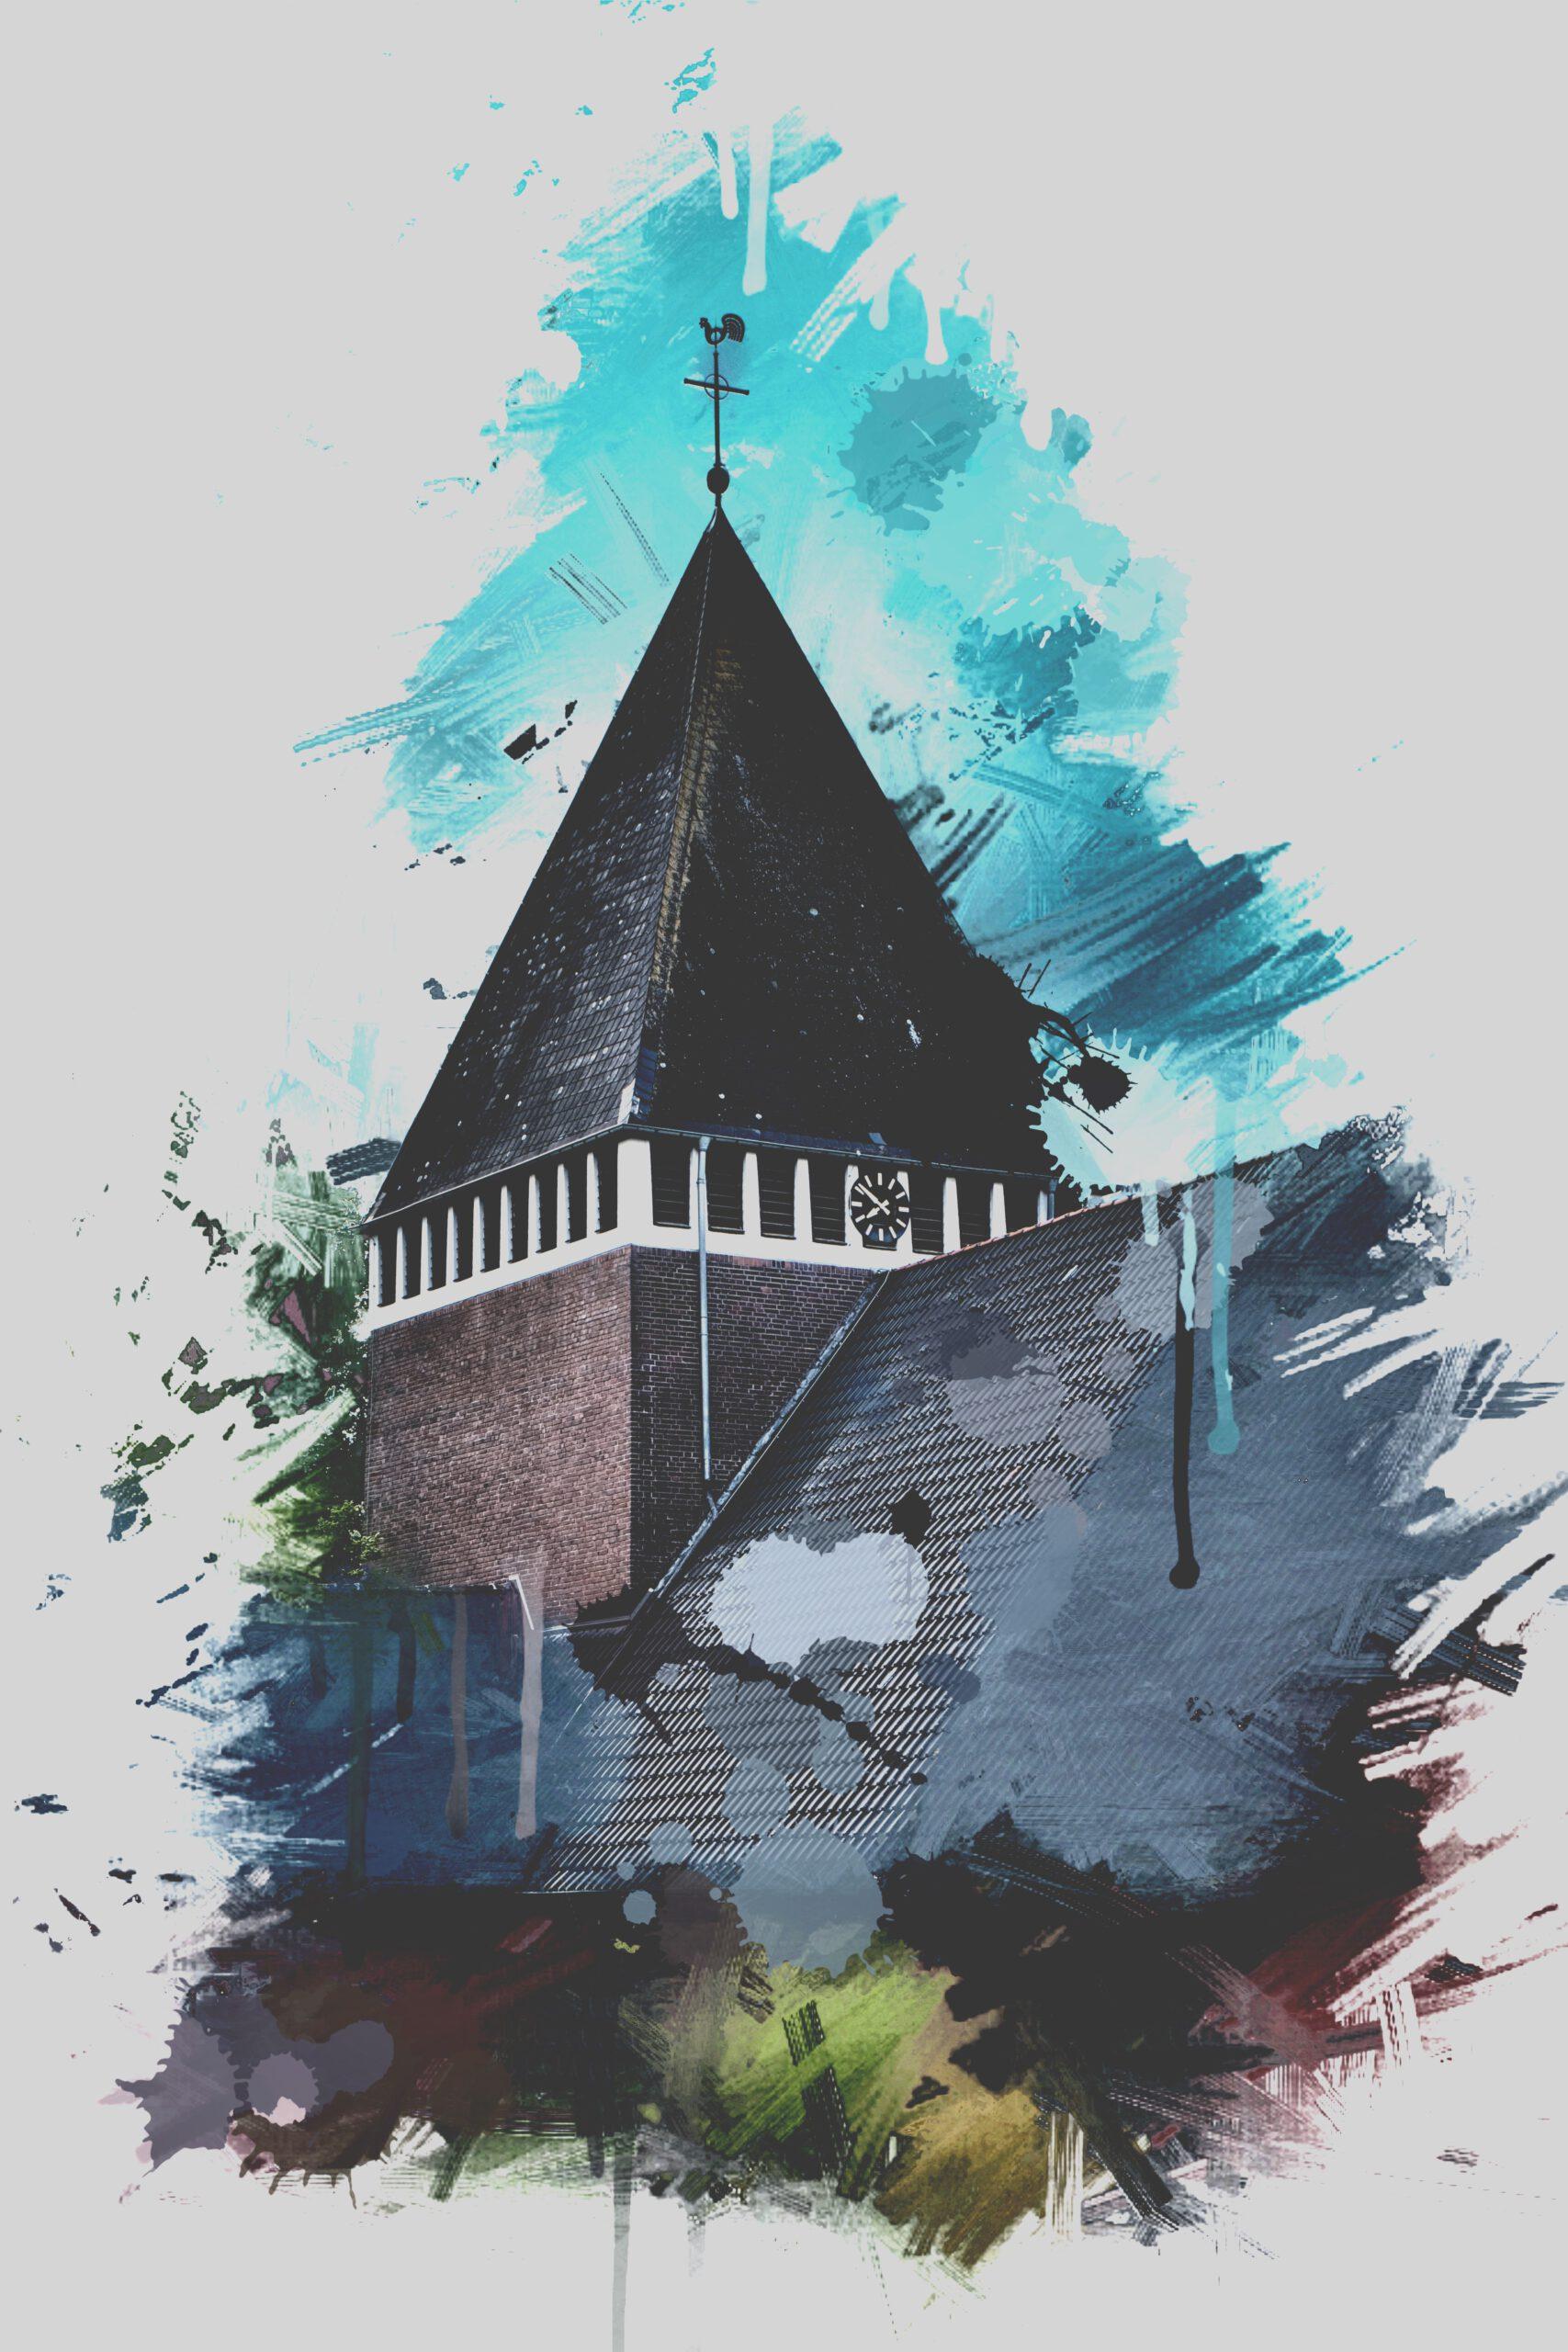 Obermörmter Kirche